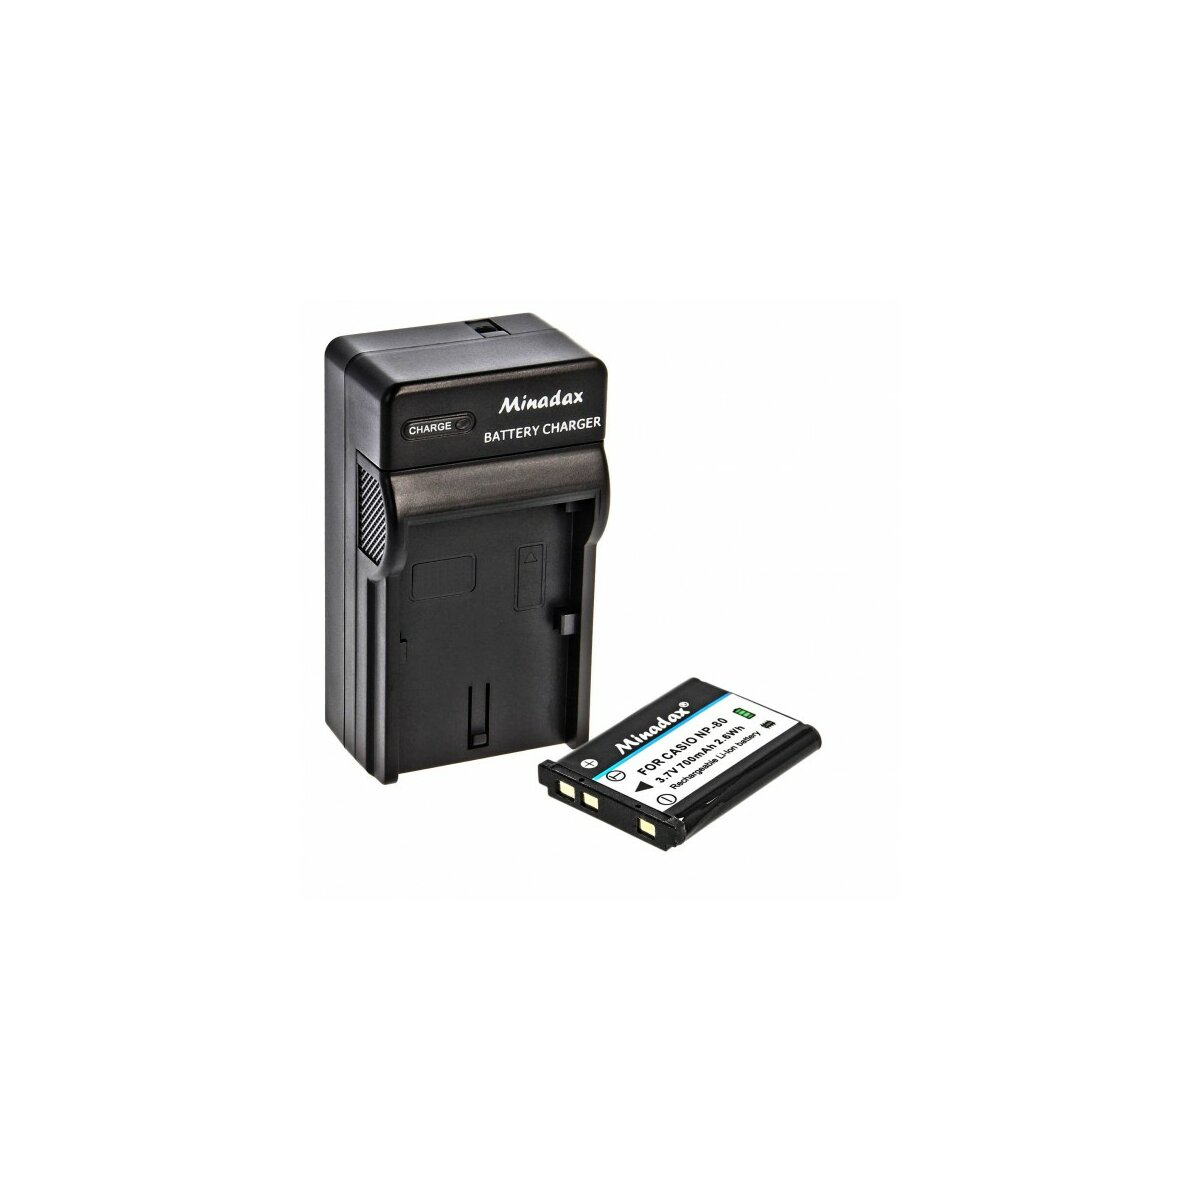 Minadax® Ladegerät 100% kompatibel mit Casio NP-80 inkl. Auto Ladekabel, Ladeschale austauschbar + 1x Akku Ersatz für NP-80